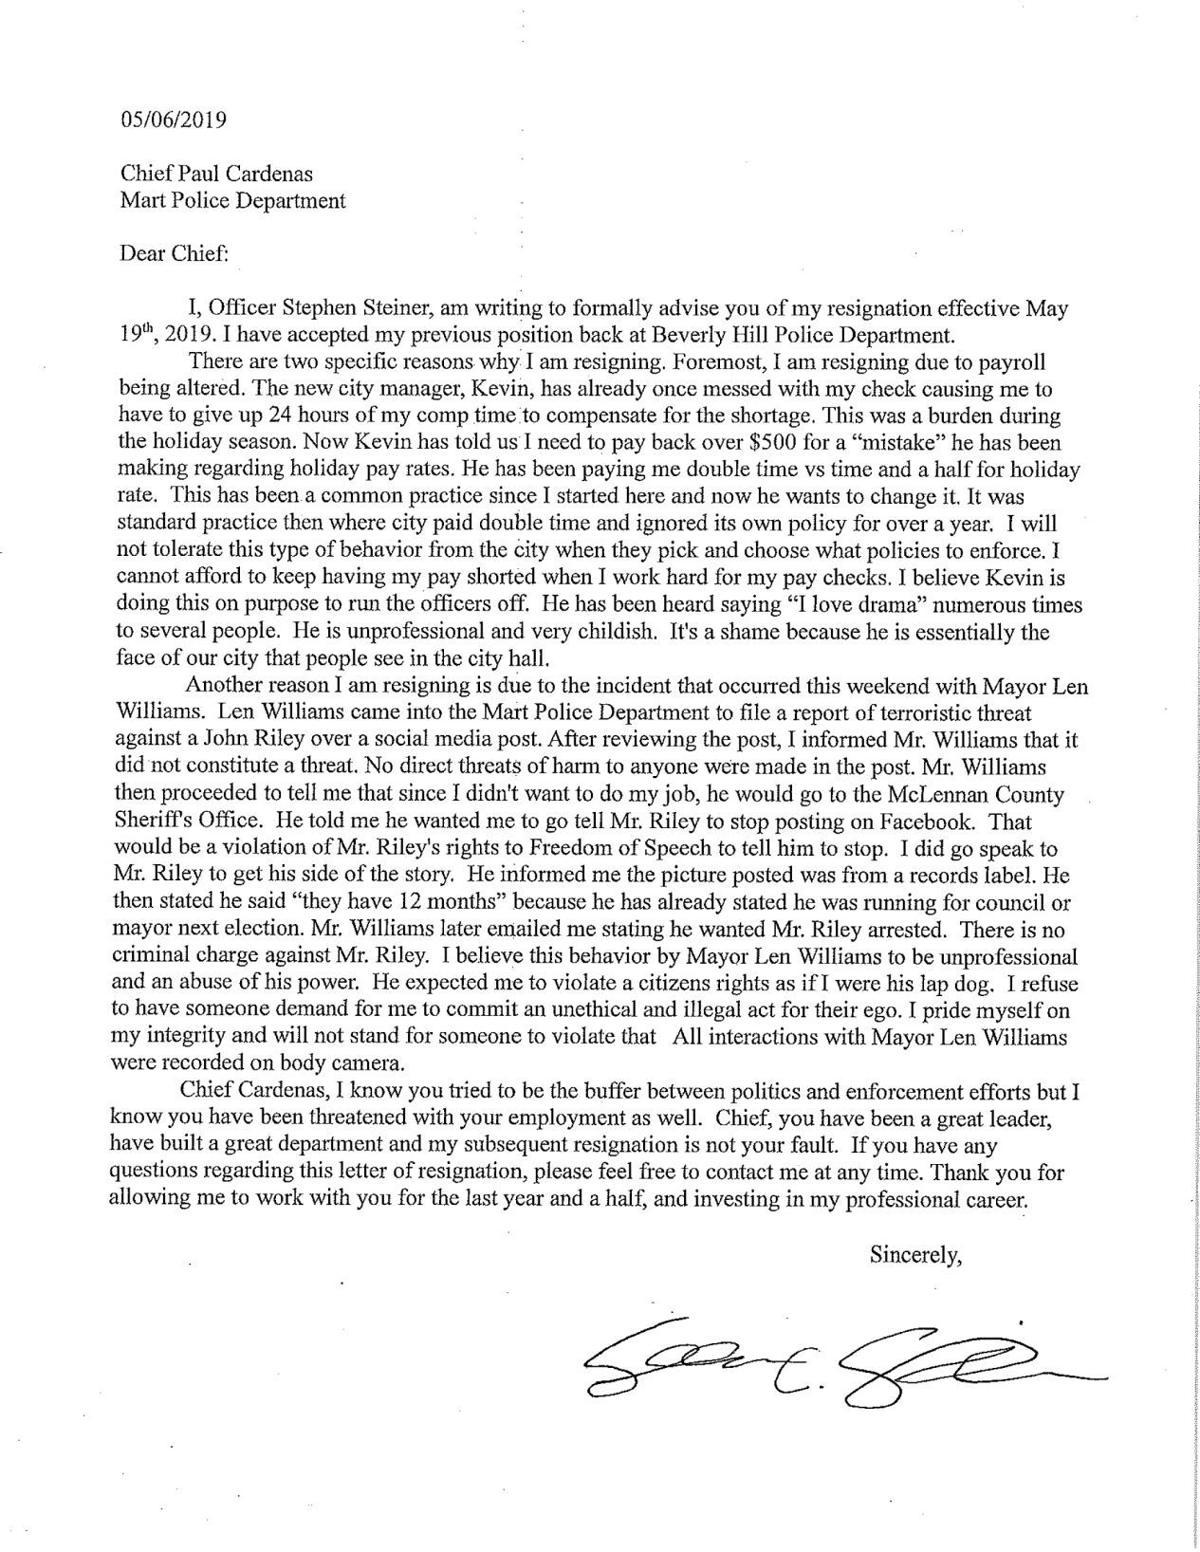 Stephen Steiner resignation letter